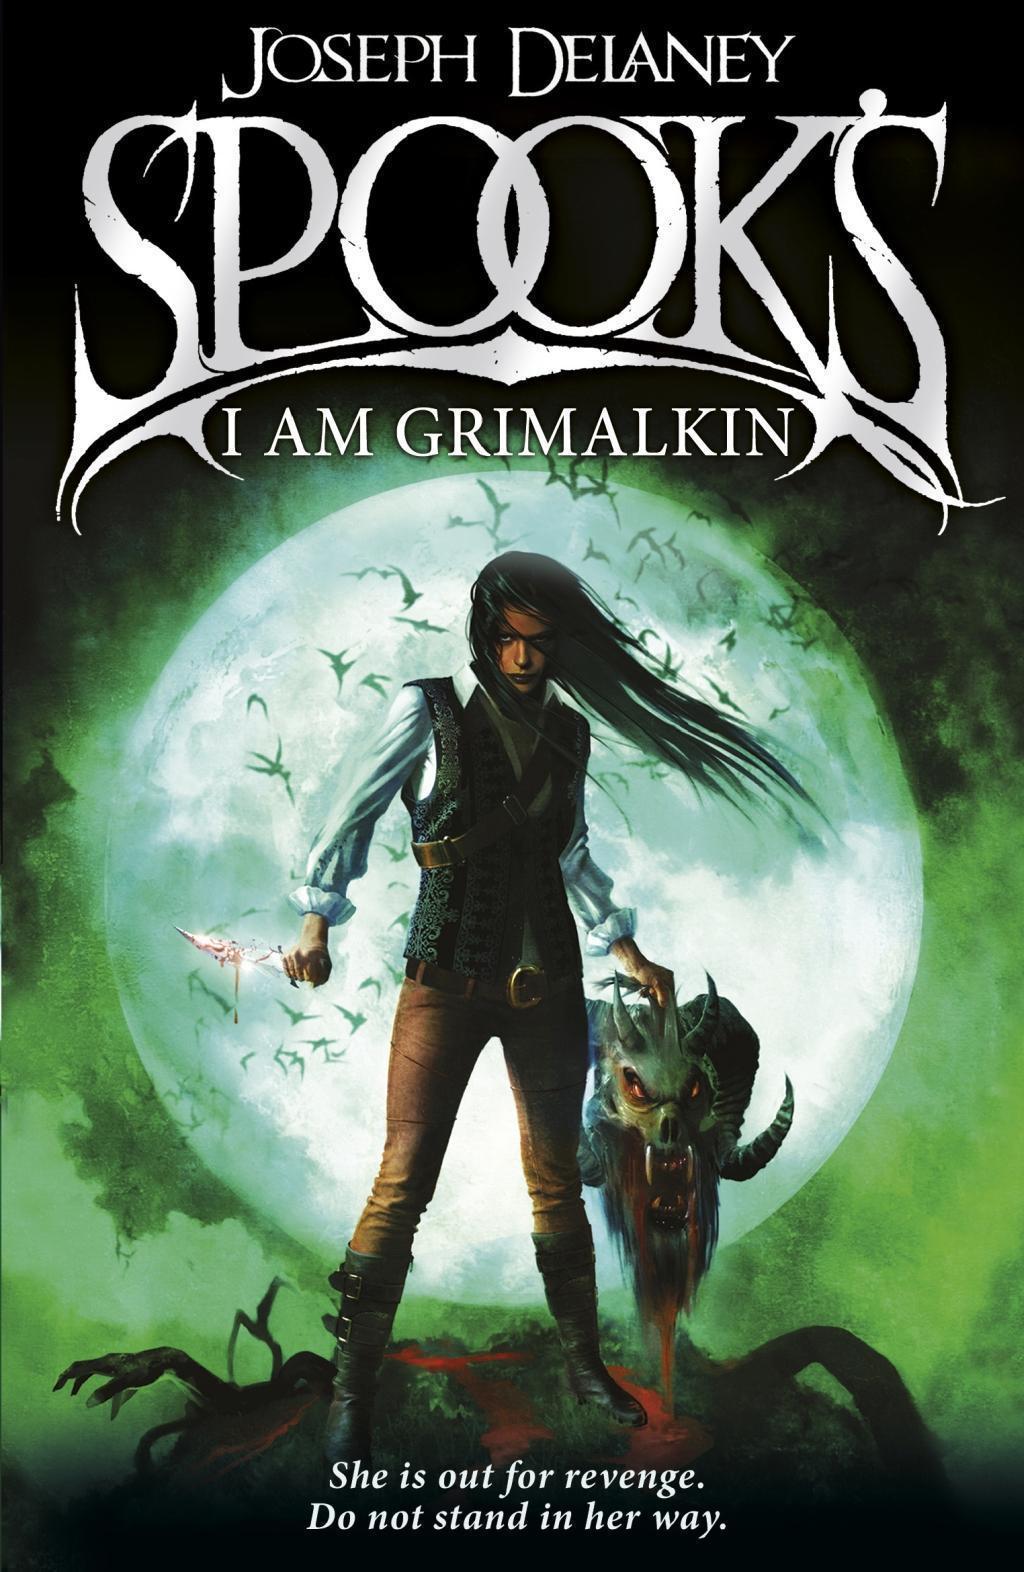 Spook's: I Am Grimalkin